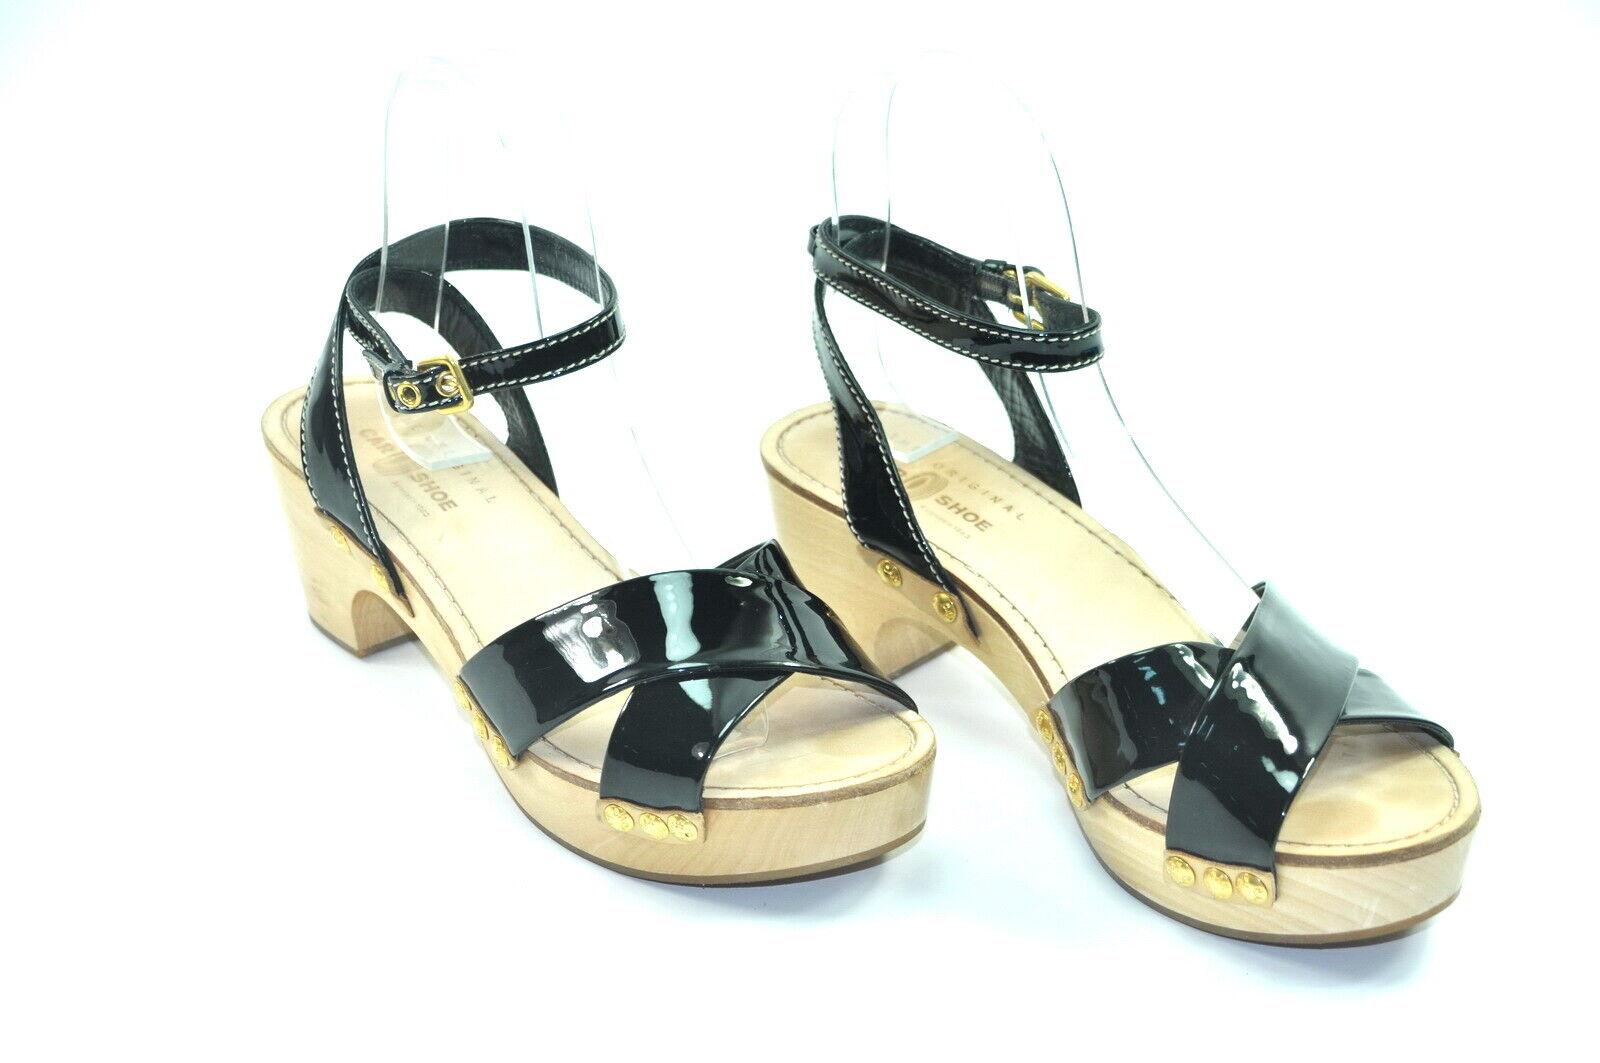 Car schuhe Damen Sandale Sandalette Pantolette Gr. 38,5 Nr. 9-H 3008